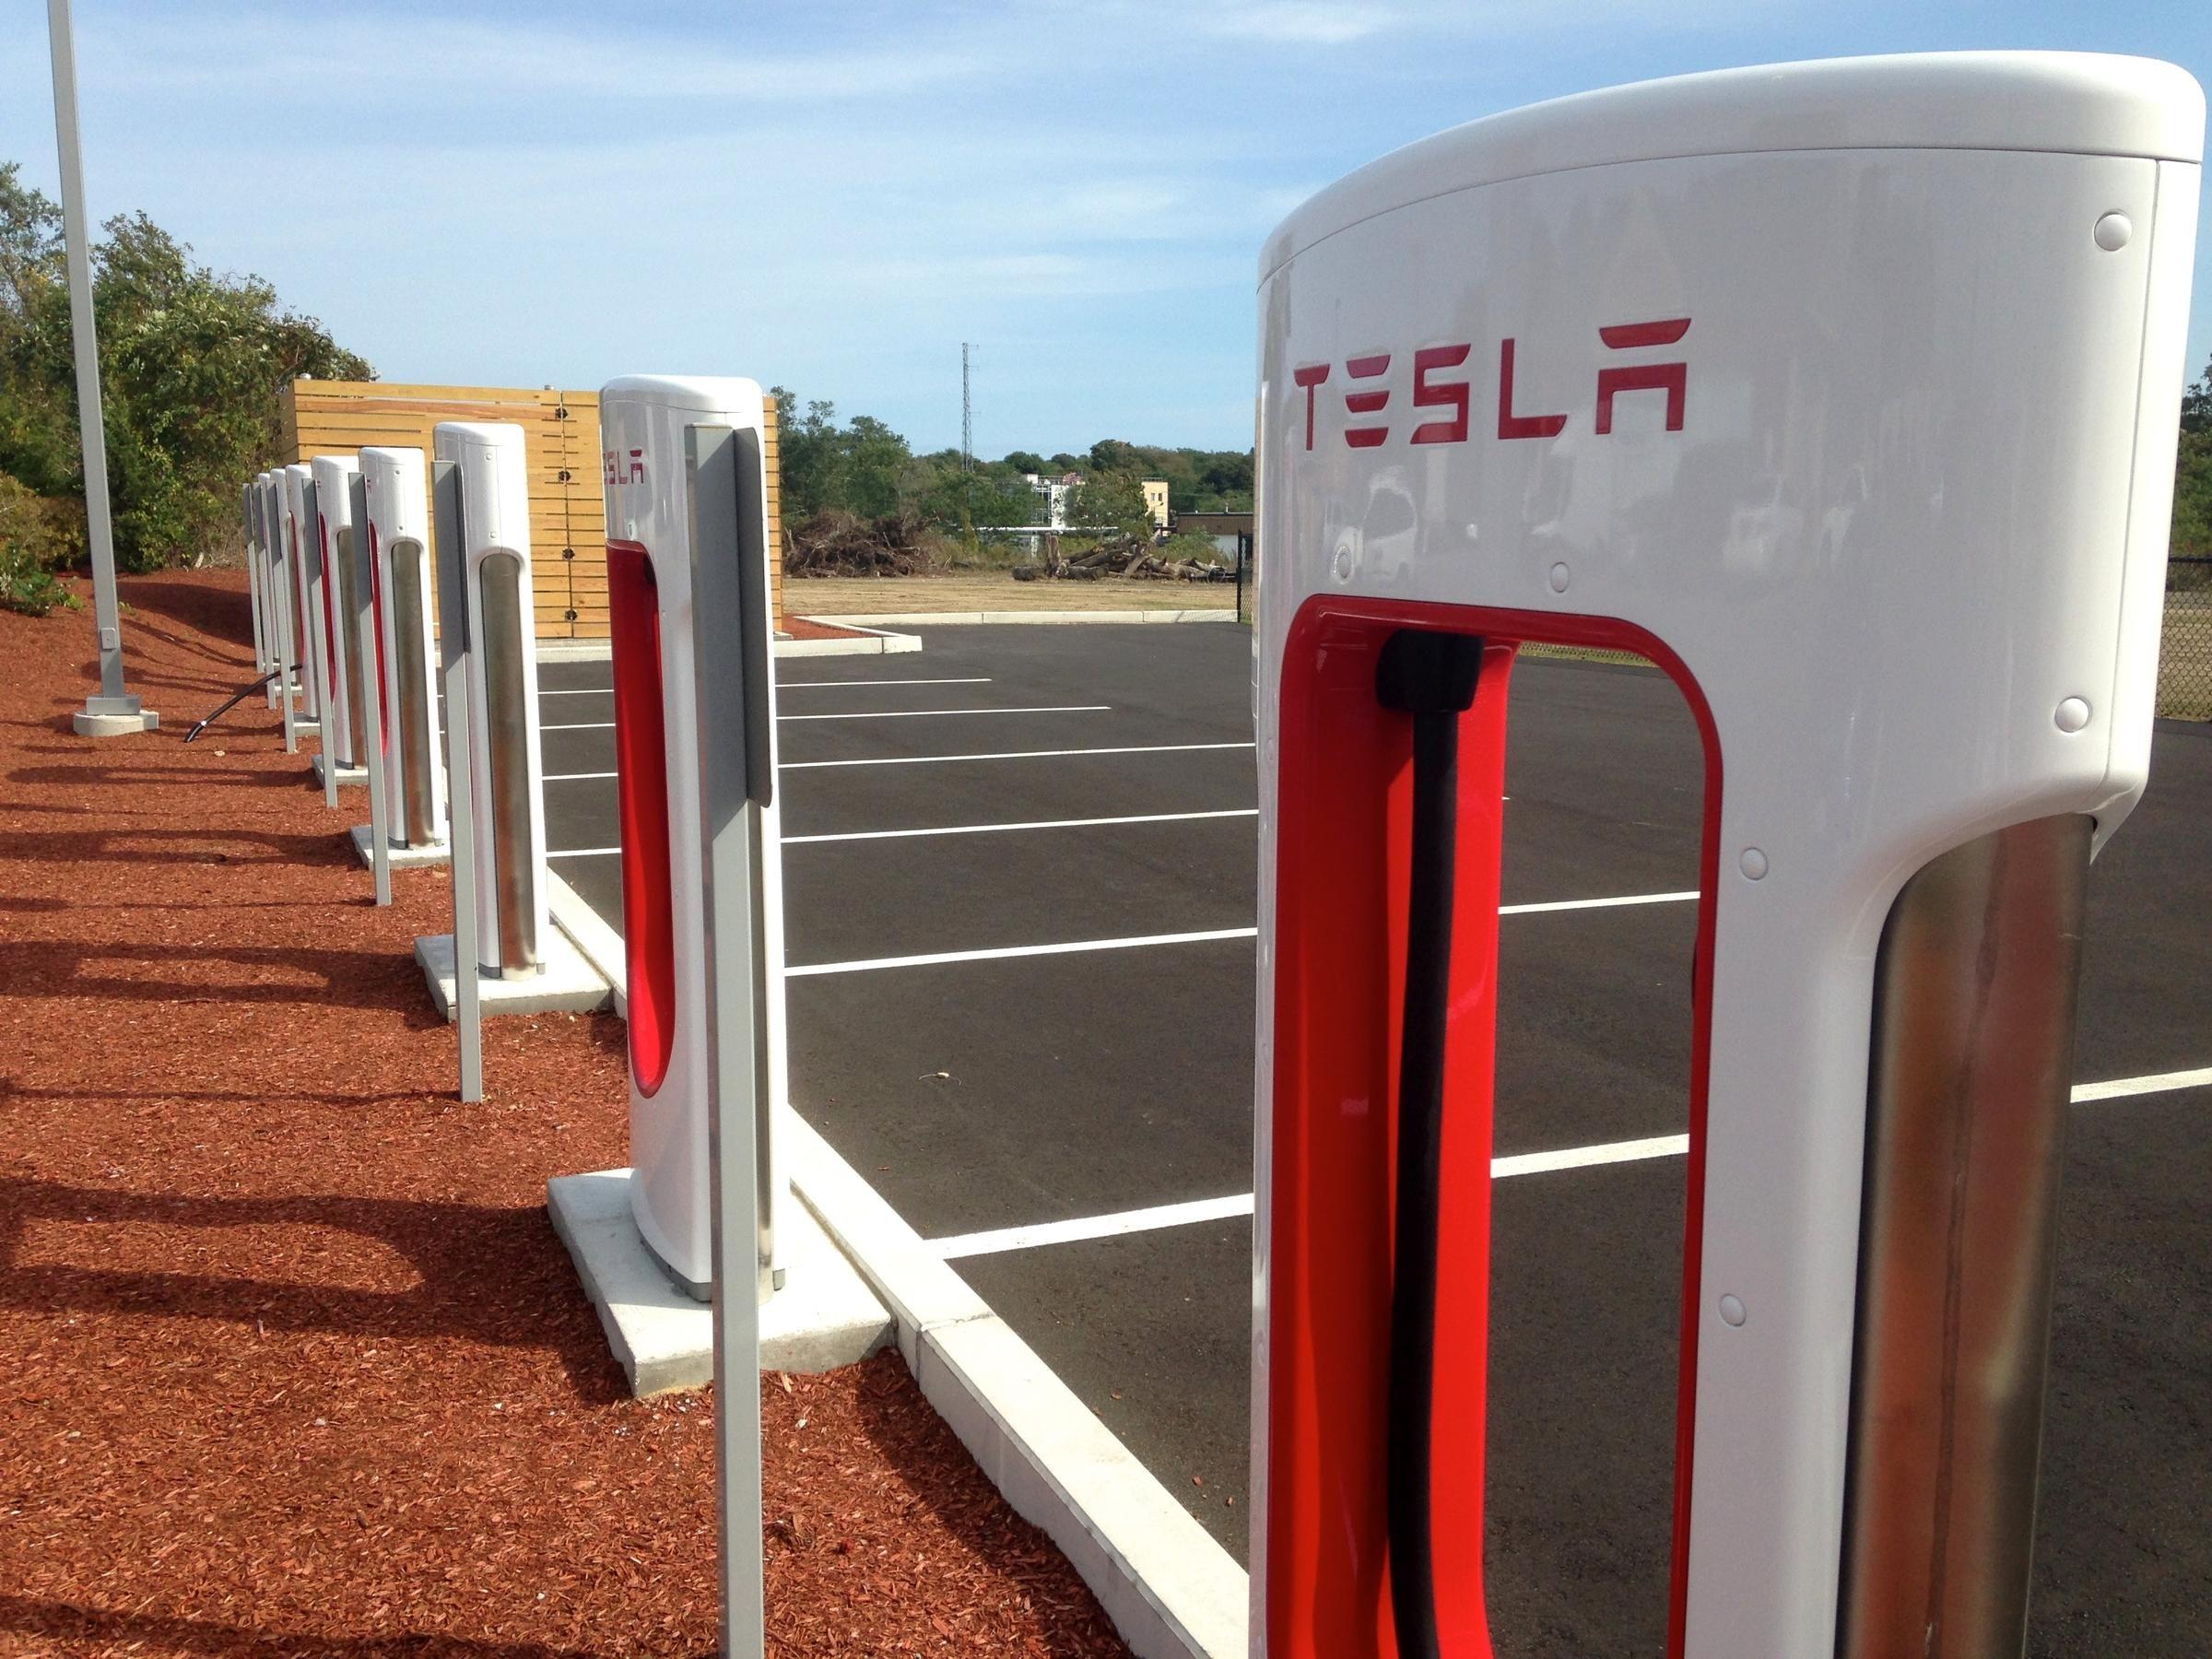 tesla charging 2400 1800 ev charge stations pinterest electric vehicle and. Black Bedroom Furniture Sets. Home Design Ideas